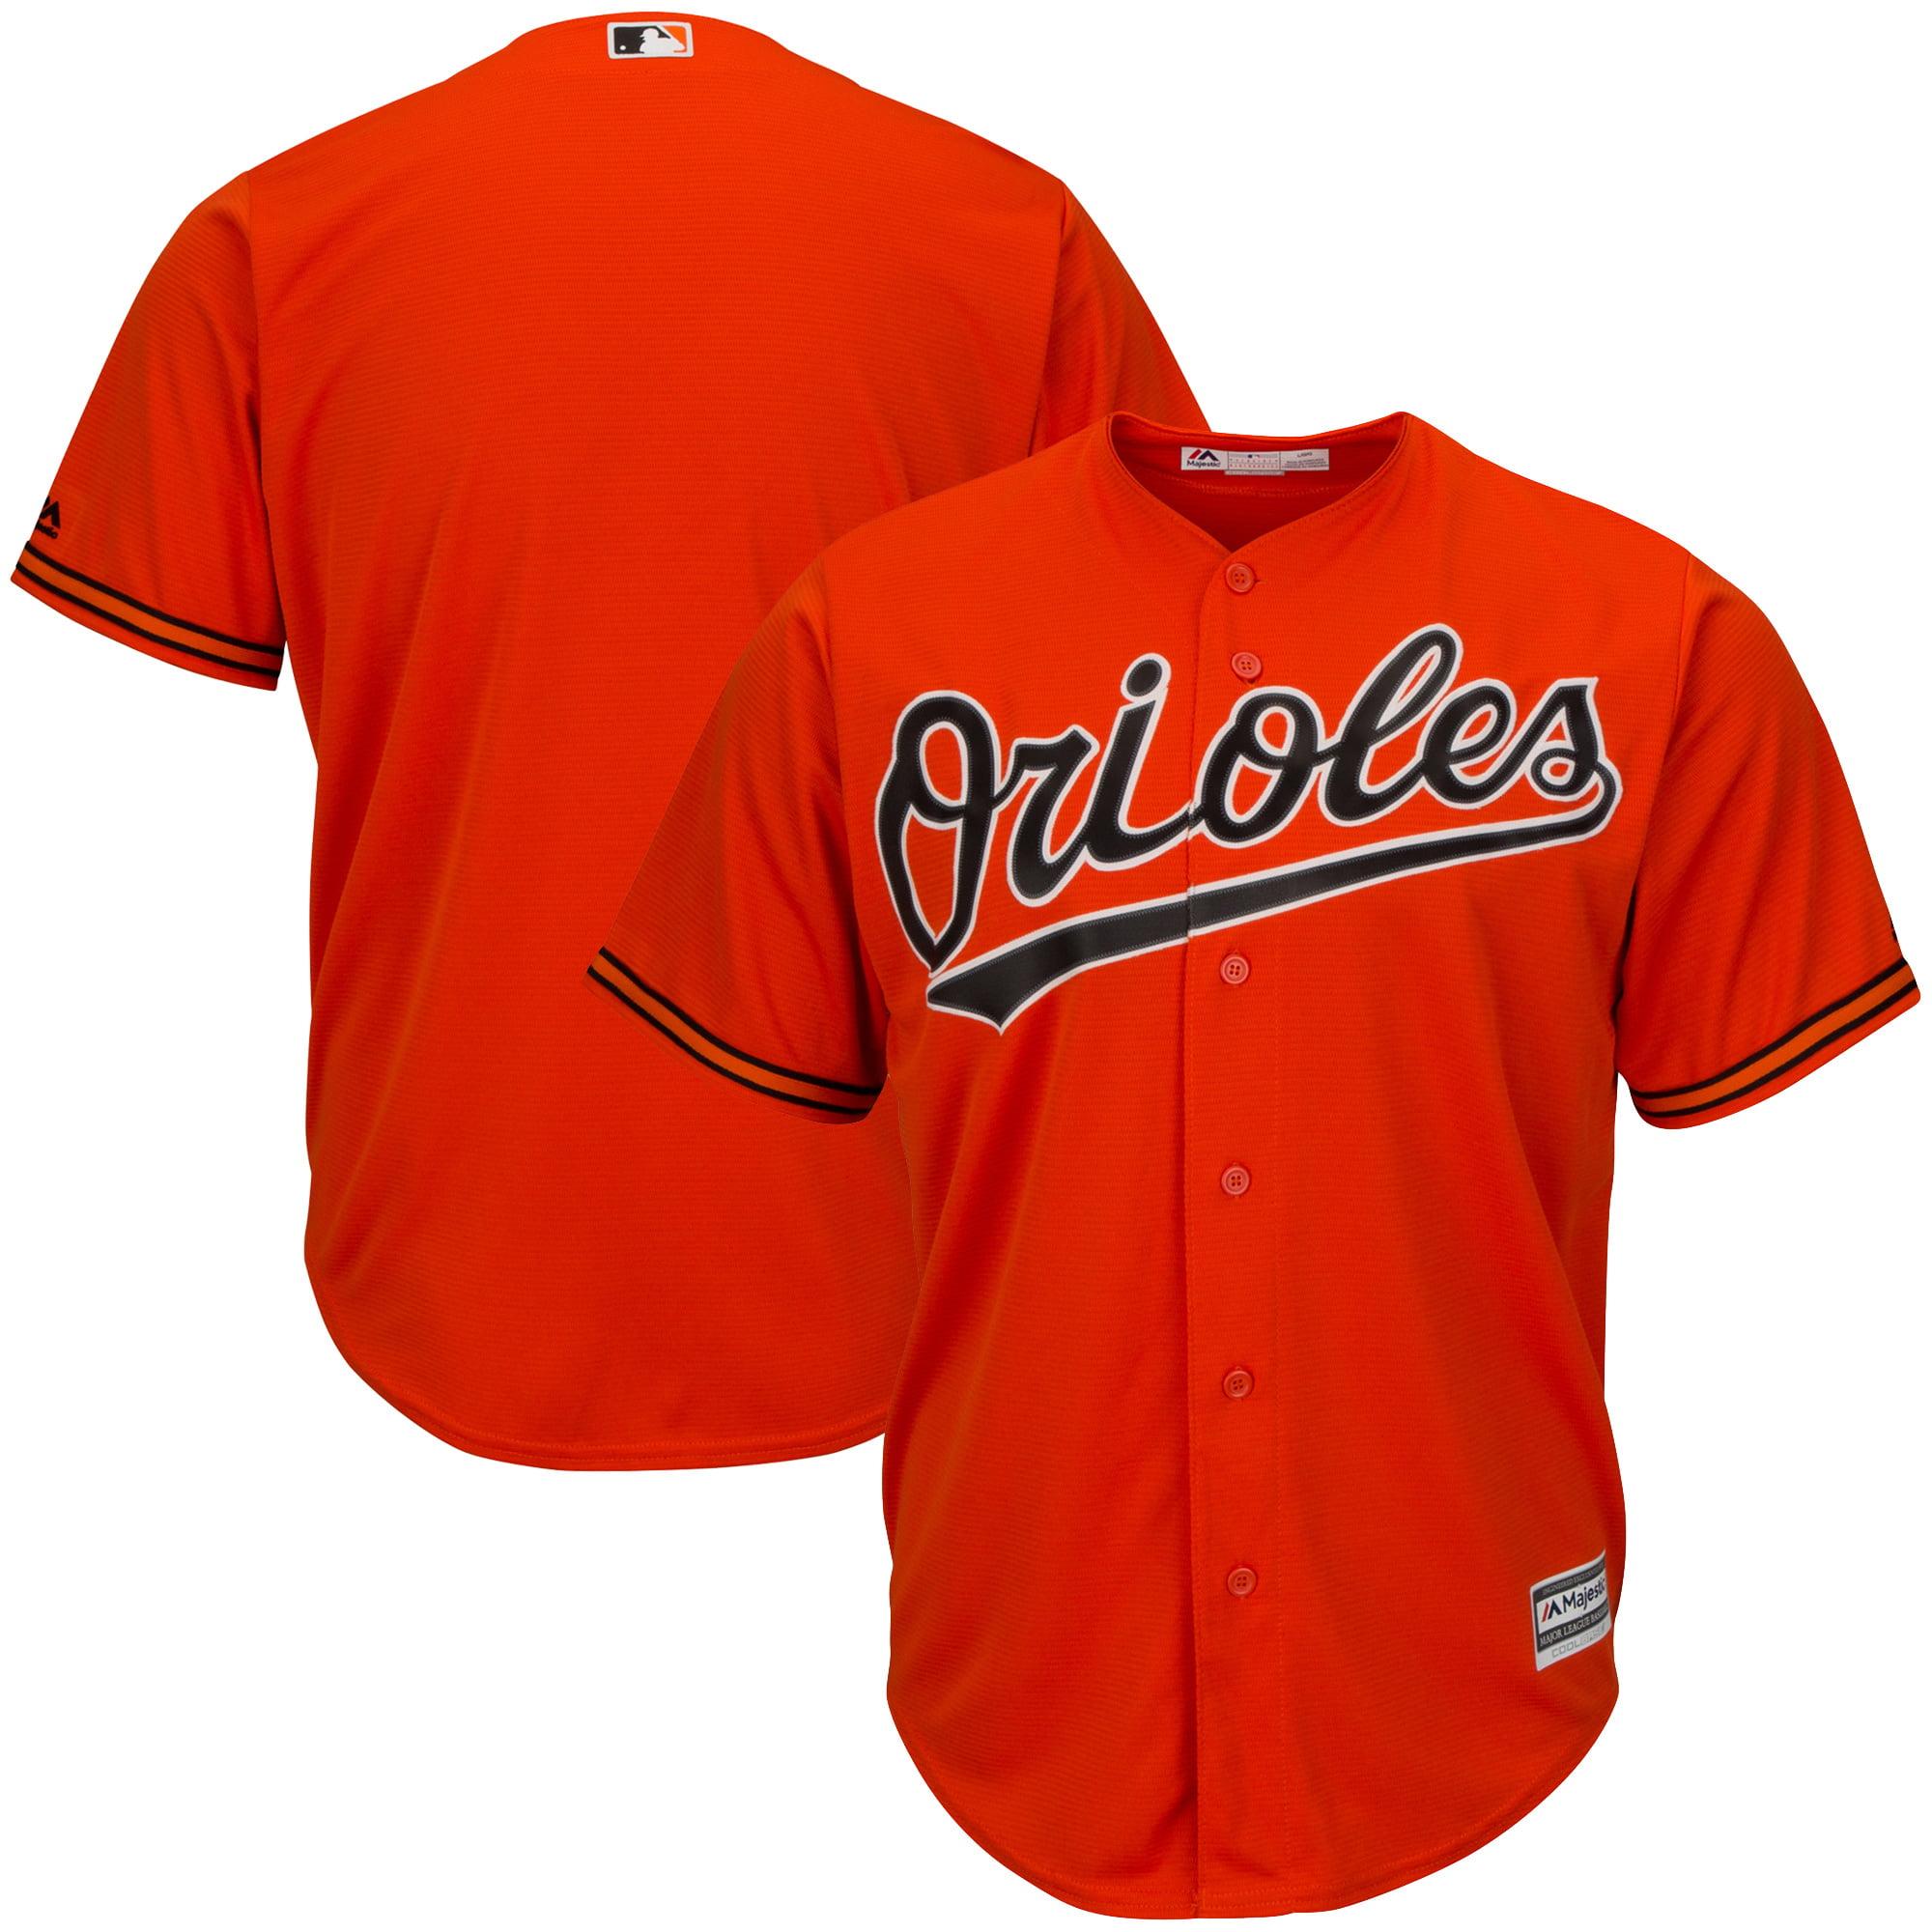 Men's Majestic Orange Baltimore Orioles Big & Tall Cool Base Team Jersey by Profile